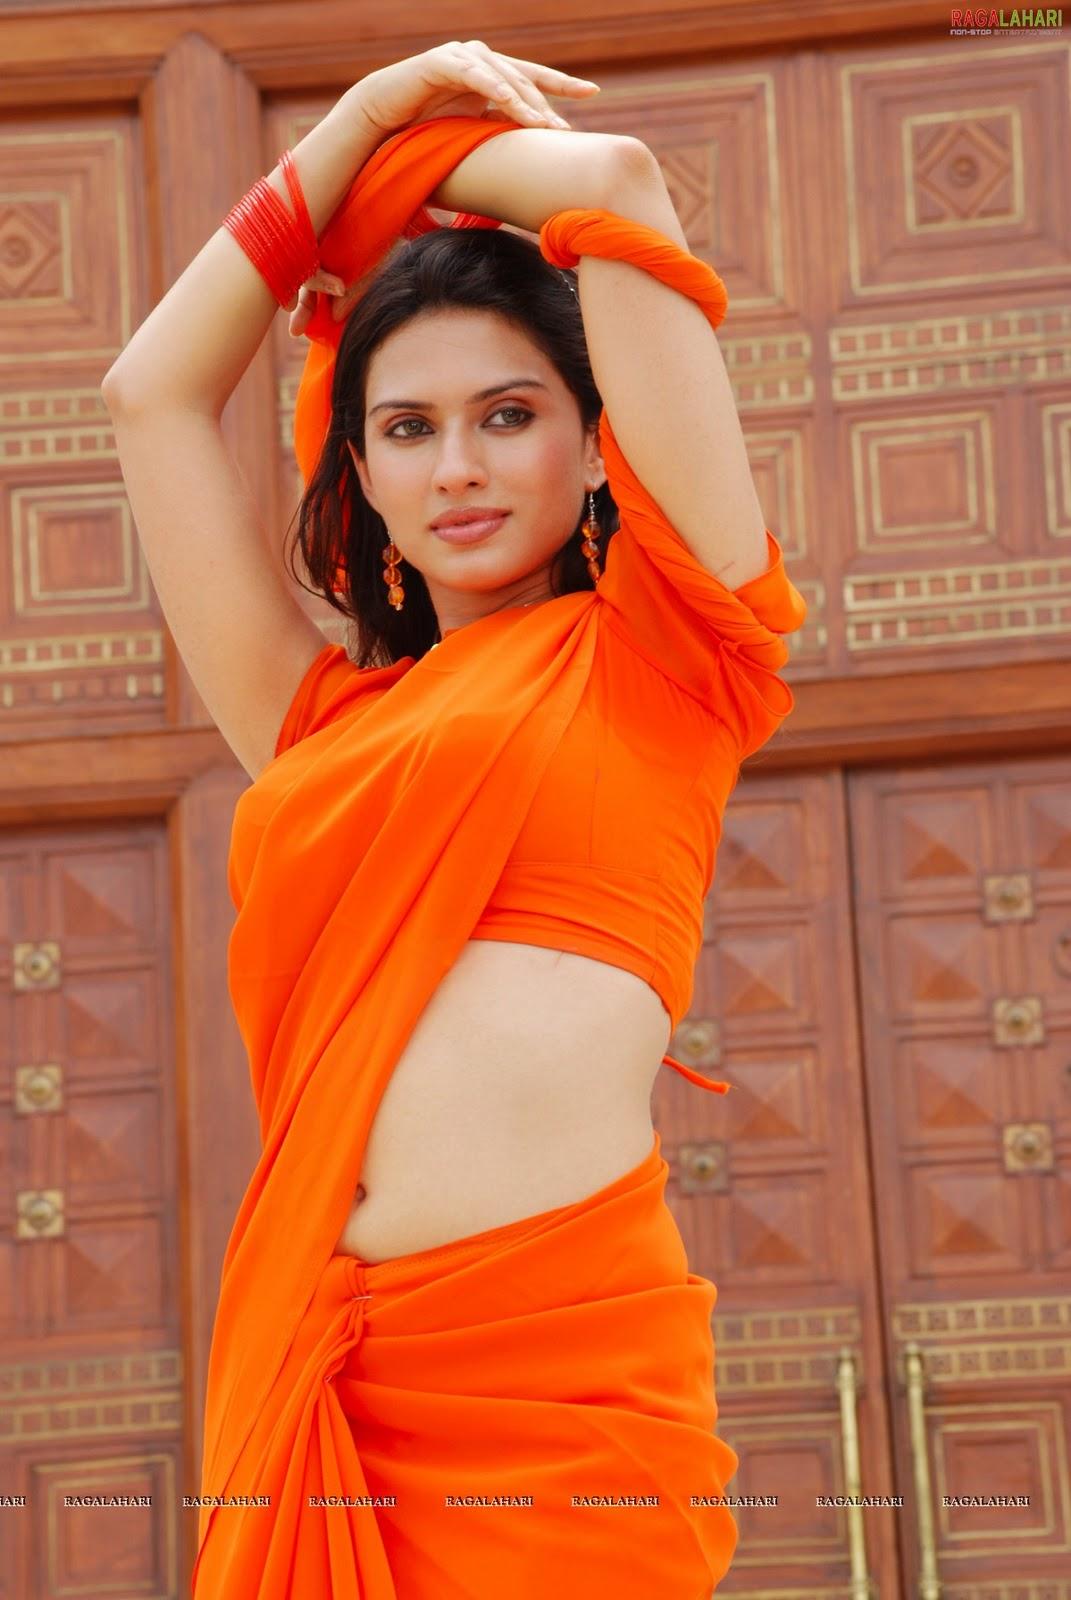 Indian desi naked telugu wife hd 1080p - 1 part 3